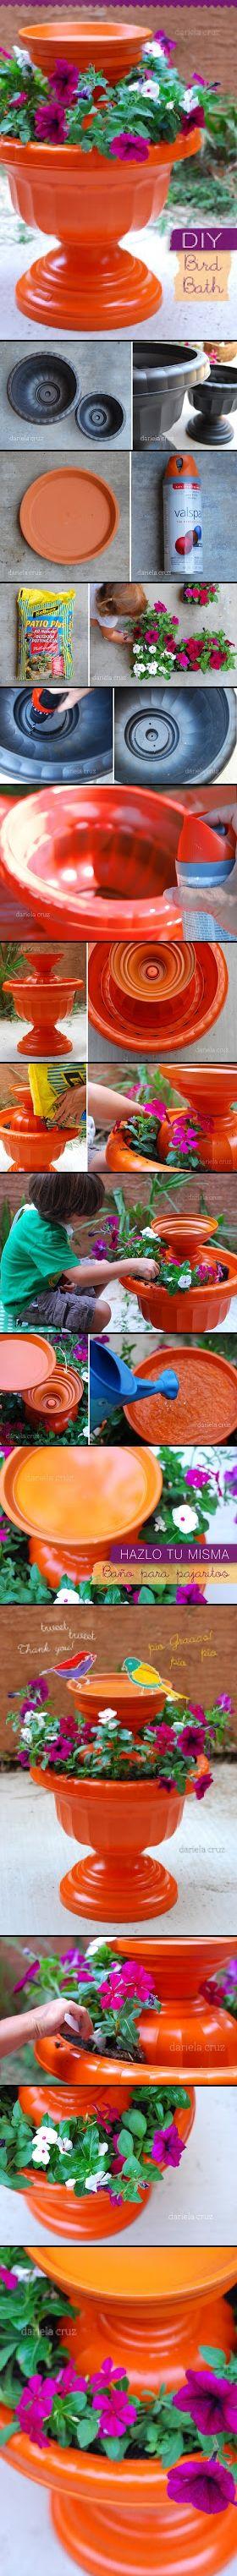 DIY Birdbath Planter #DIY #Birdbath #Planter #Cheap #Easy #Upcycle #Garden #Bird #Bath #Feeder #BirdFeeder